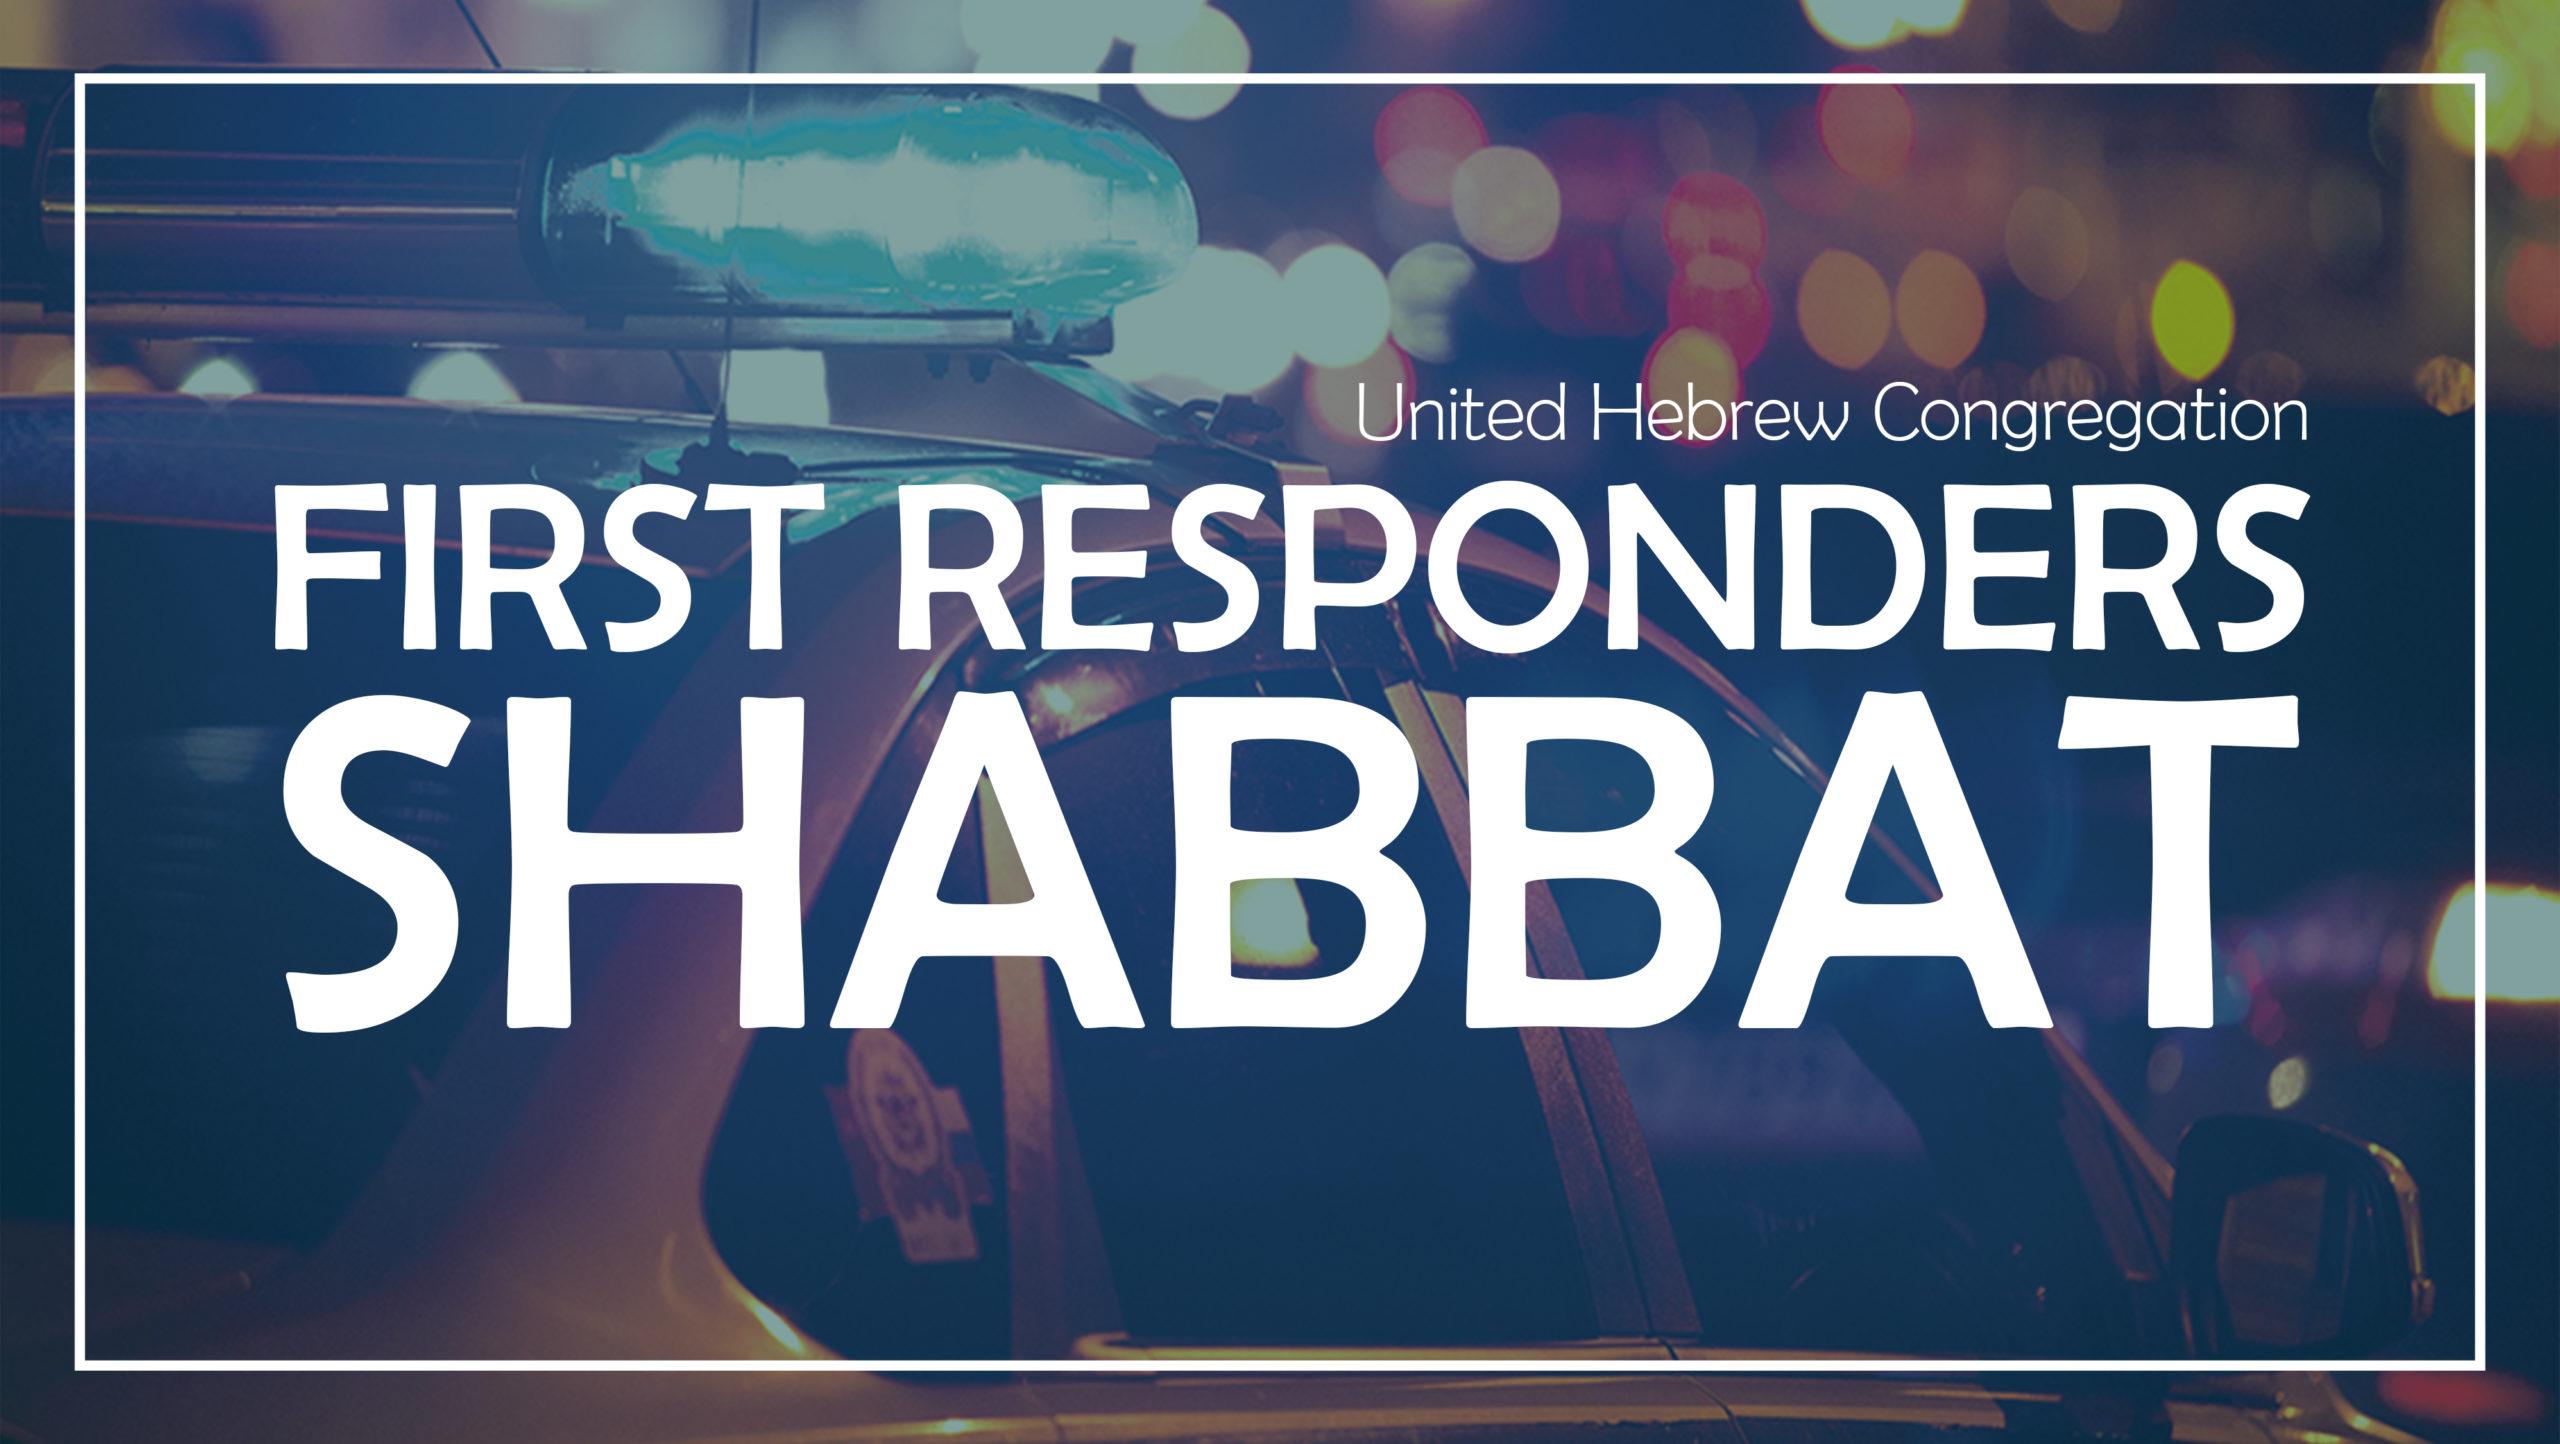 First Responders Shabbat